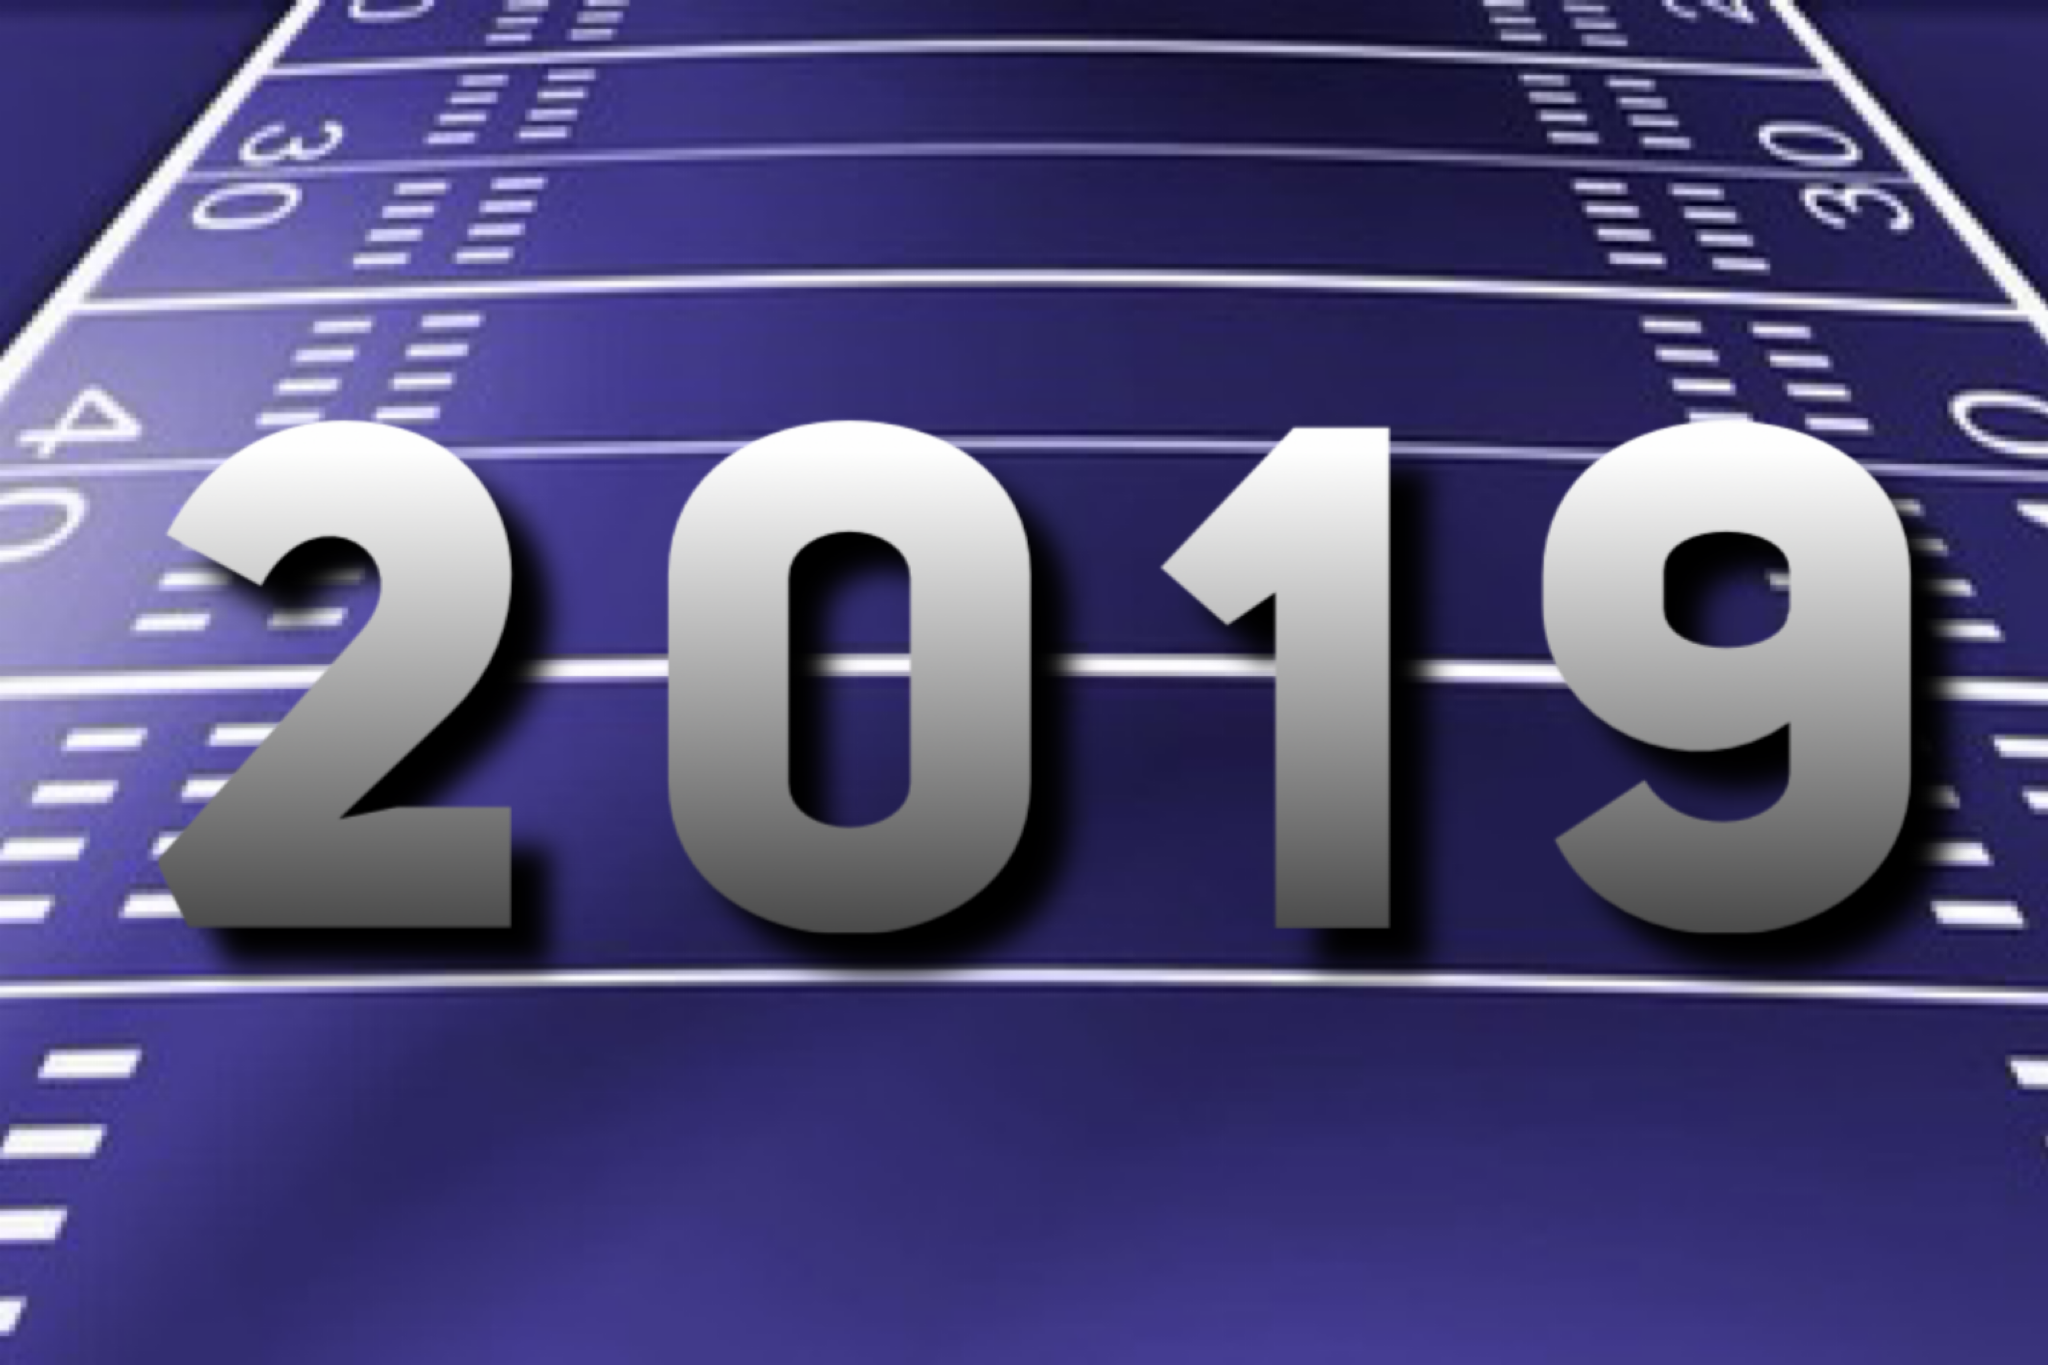 2019 Offensive Line Scoring